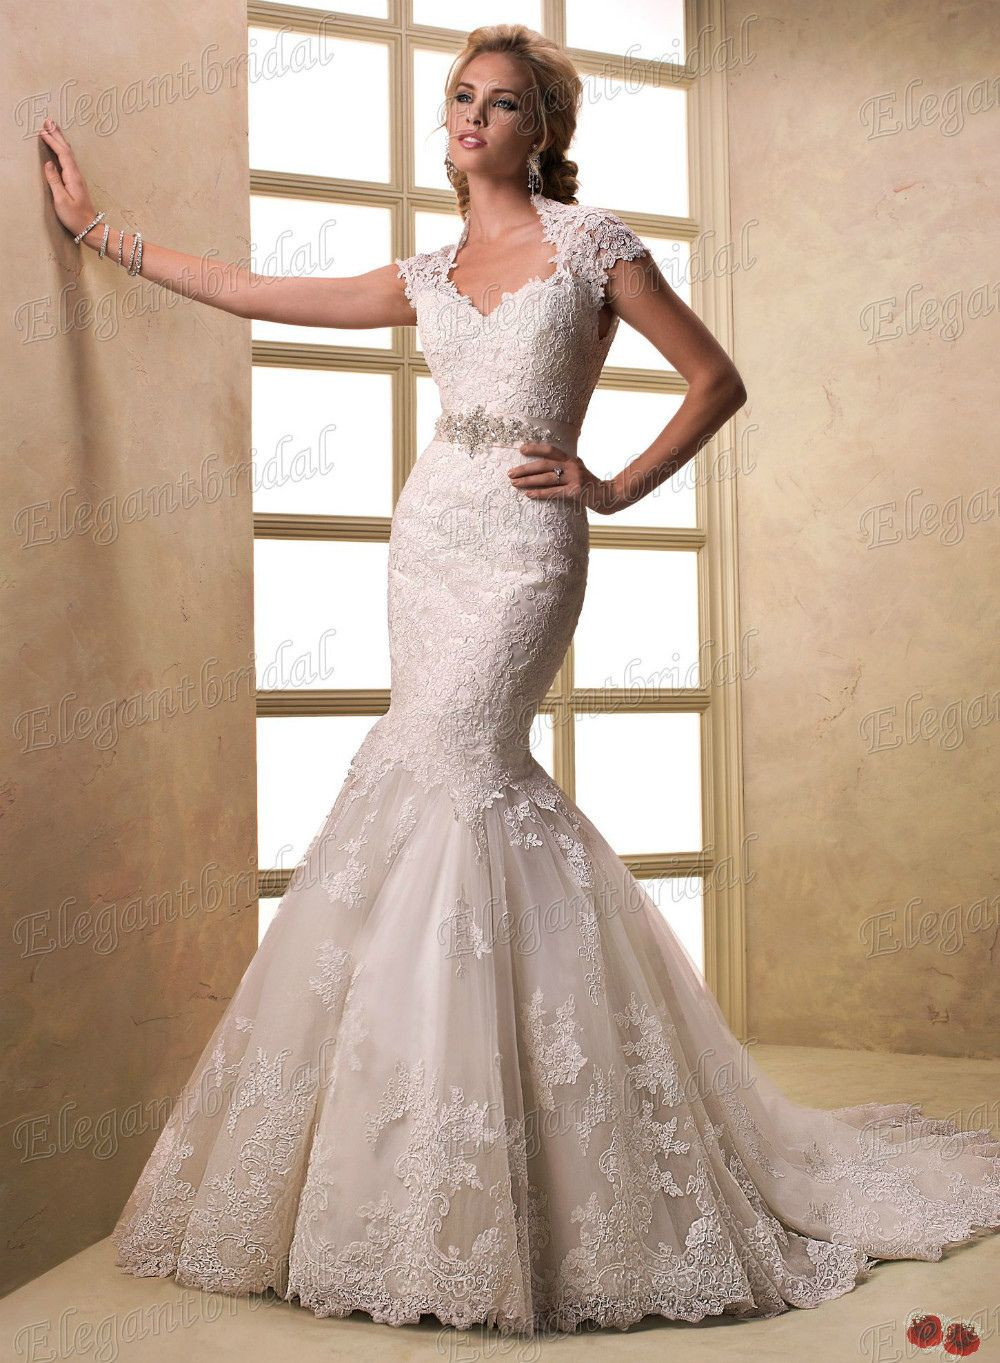 77+ Spanish Lace Wedding Dress - Wedding Dresses for Plus Size Check ...